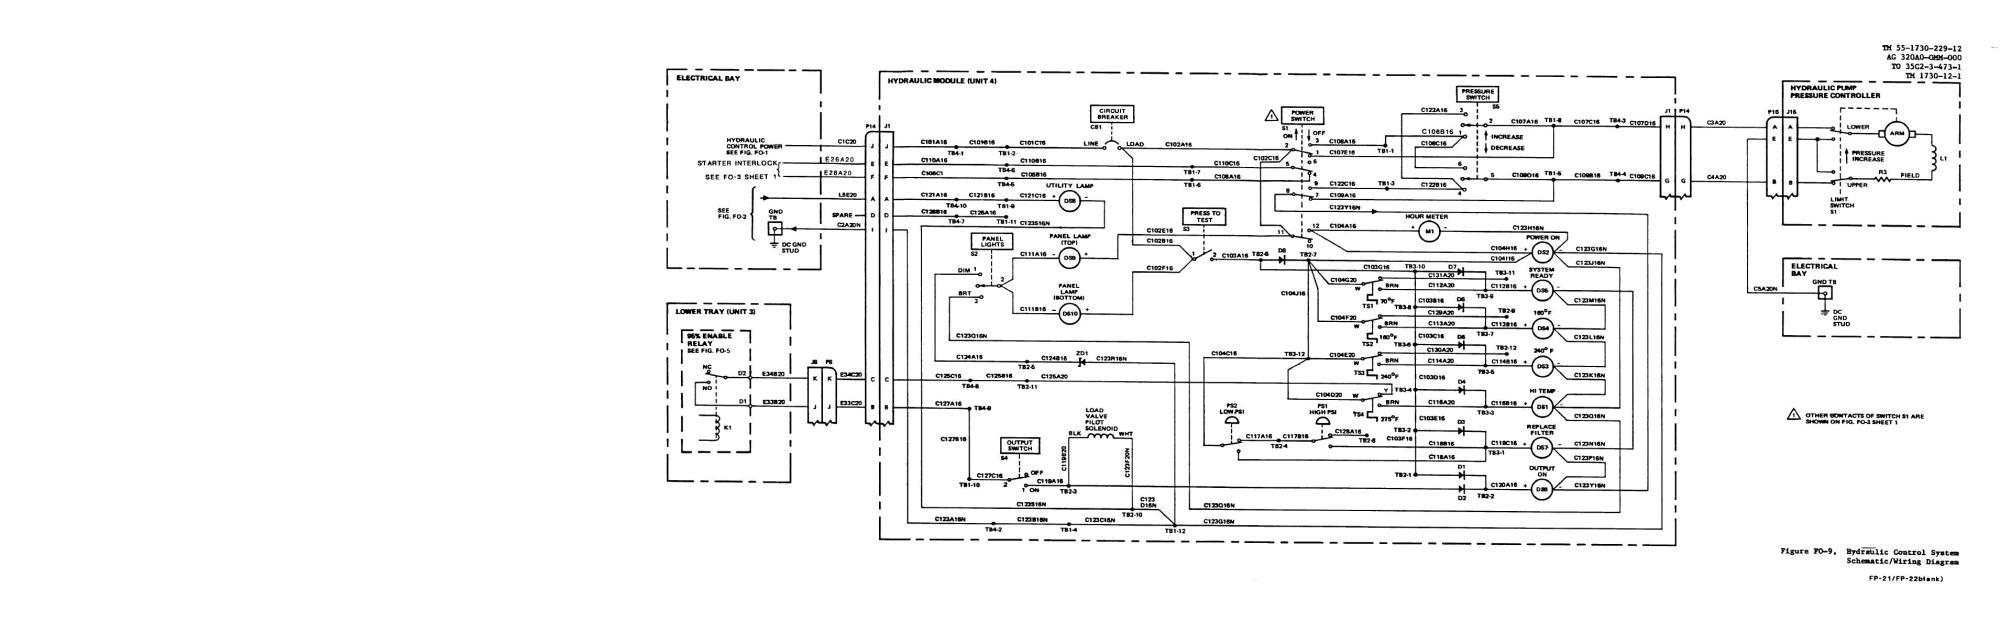 hight resolution of figure fo 9 hydraulic control system schematic wiring diagram rh powersupplies tpub com hydraulic control circuit diagram hydraulic control circuit diagram